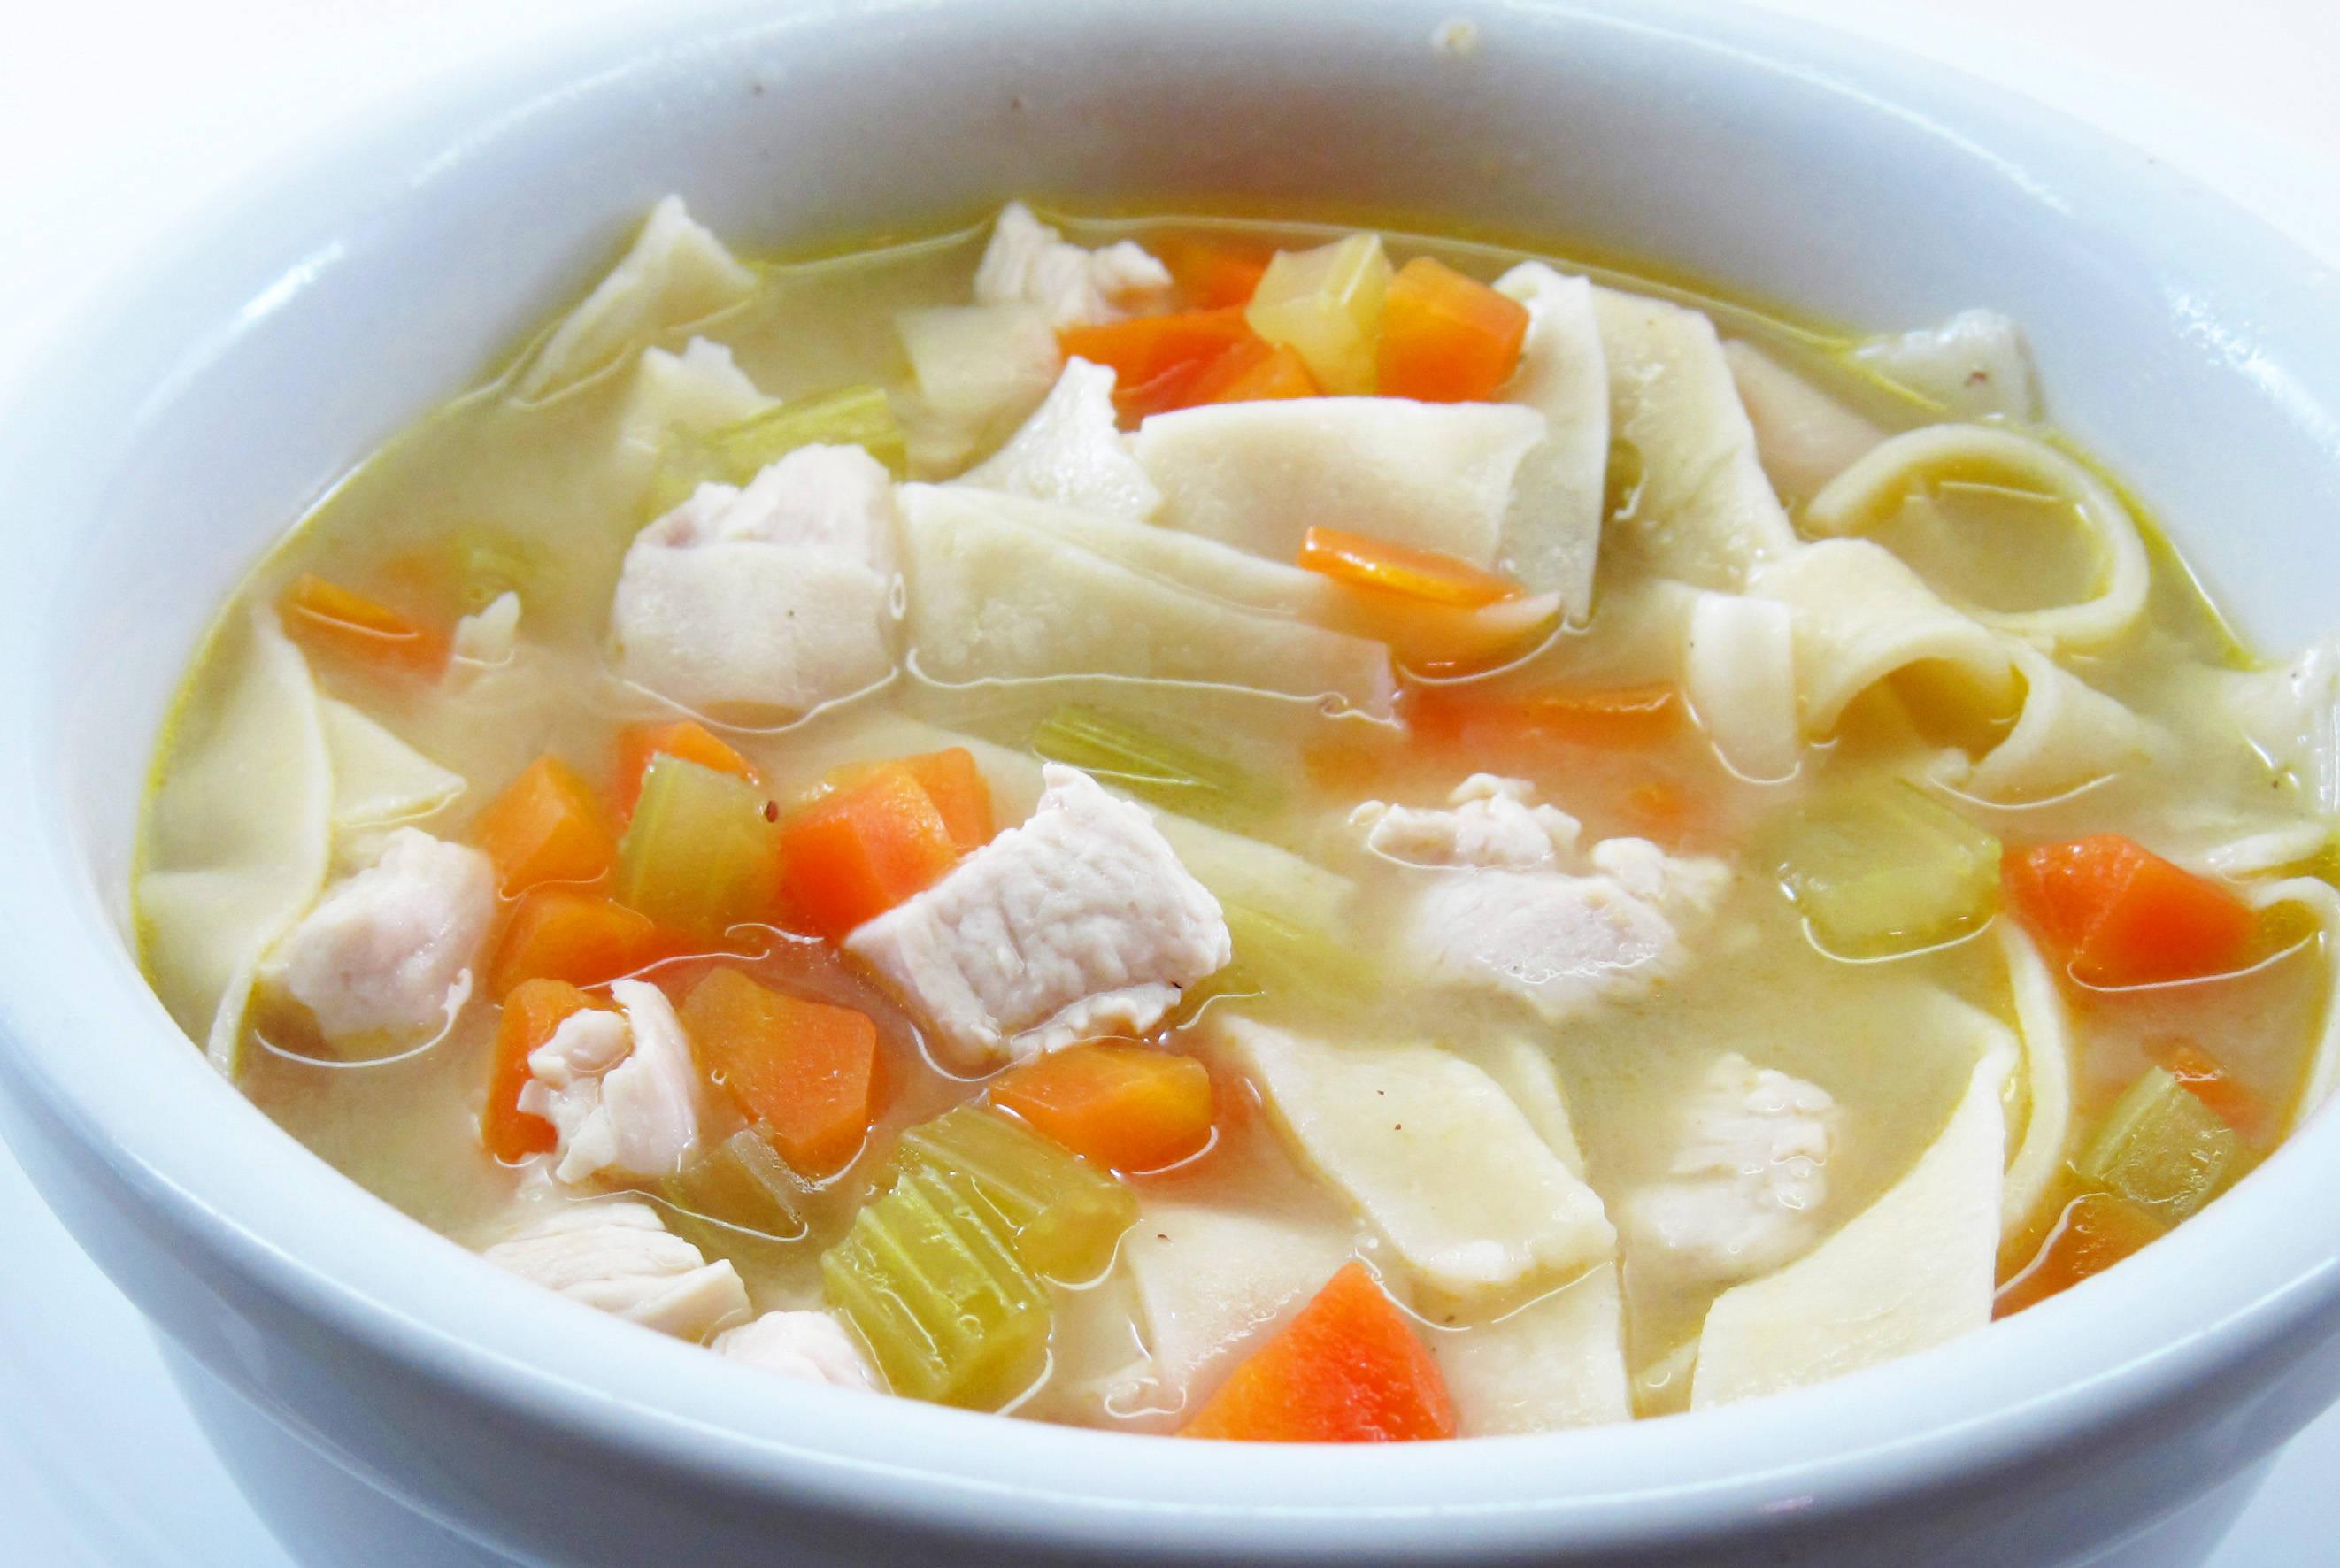 Eagle, CO Chicken Noodle Soup & Bazaar